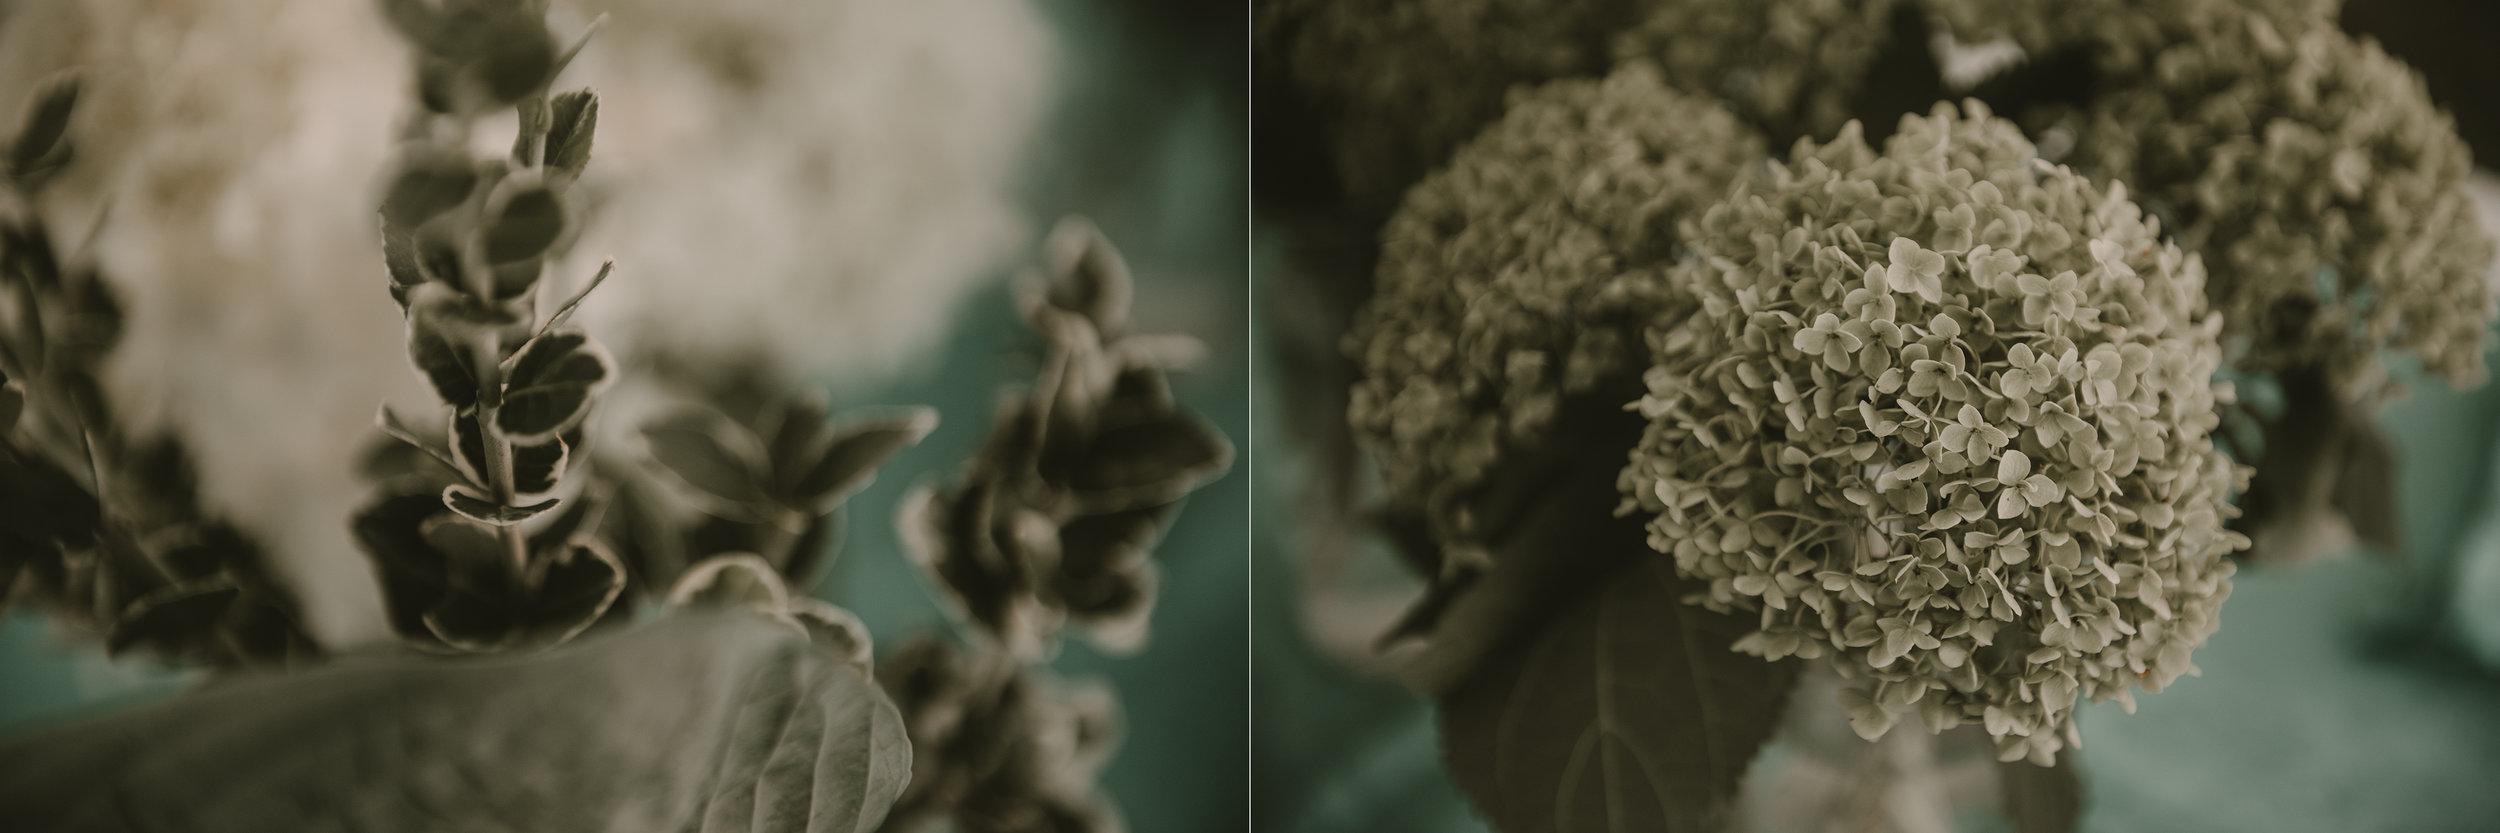 j&h_flowers2.jpg